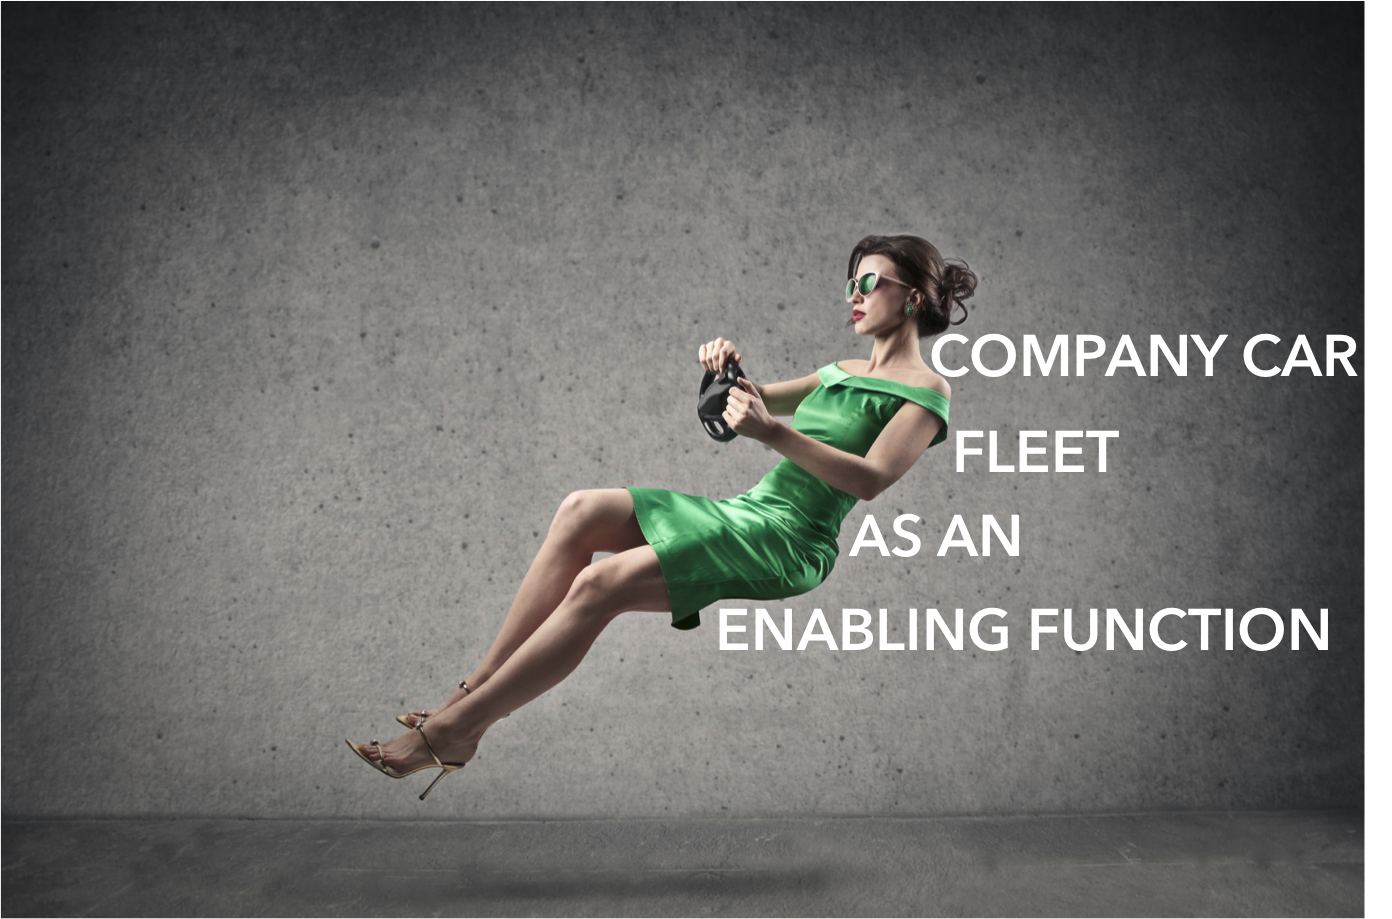 Company car fleet as an enabling function